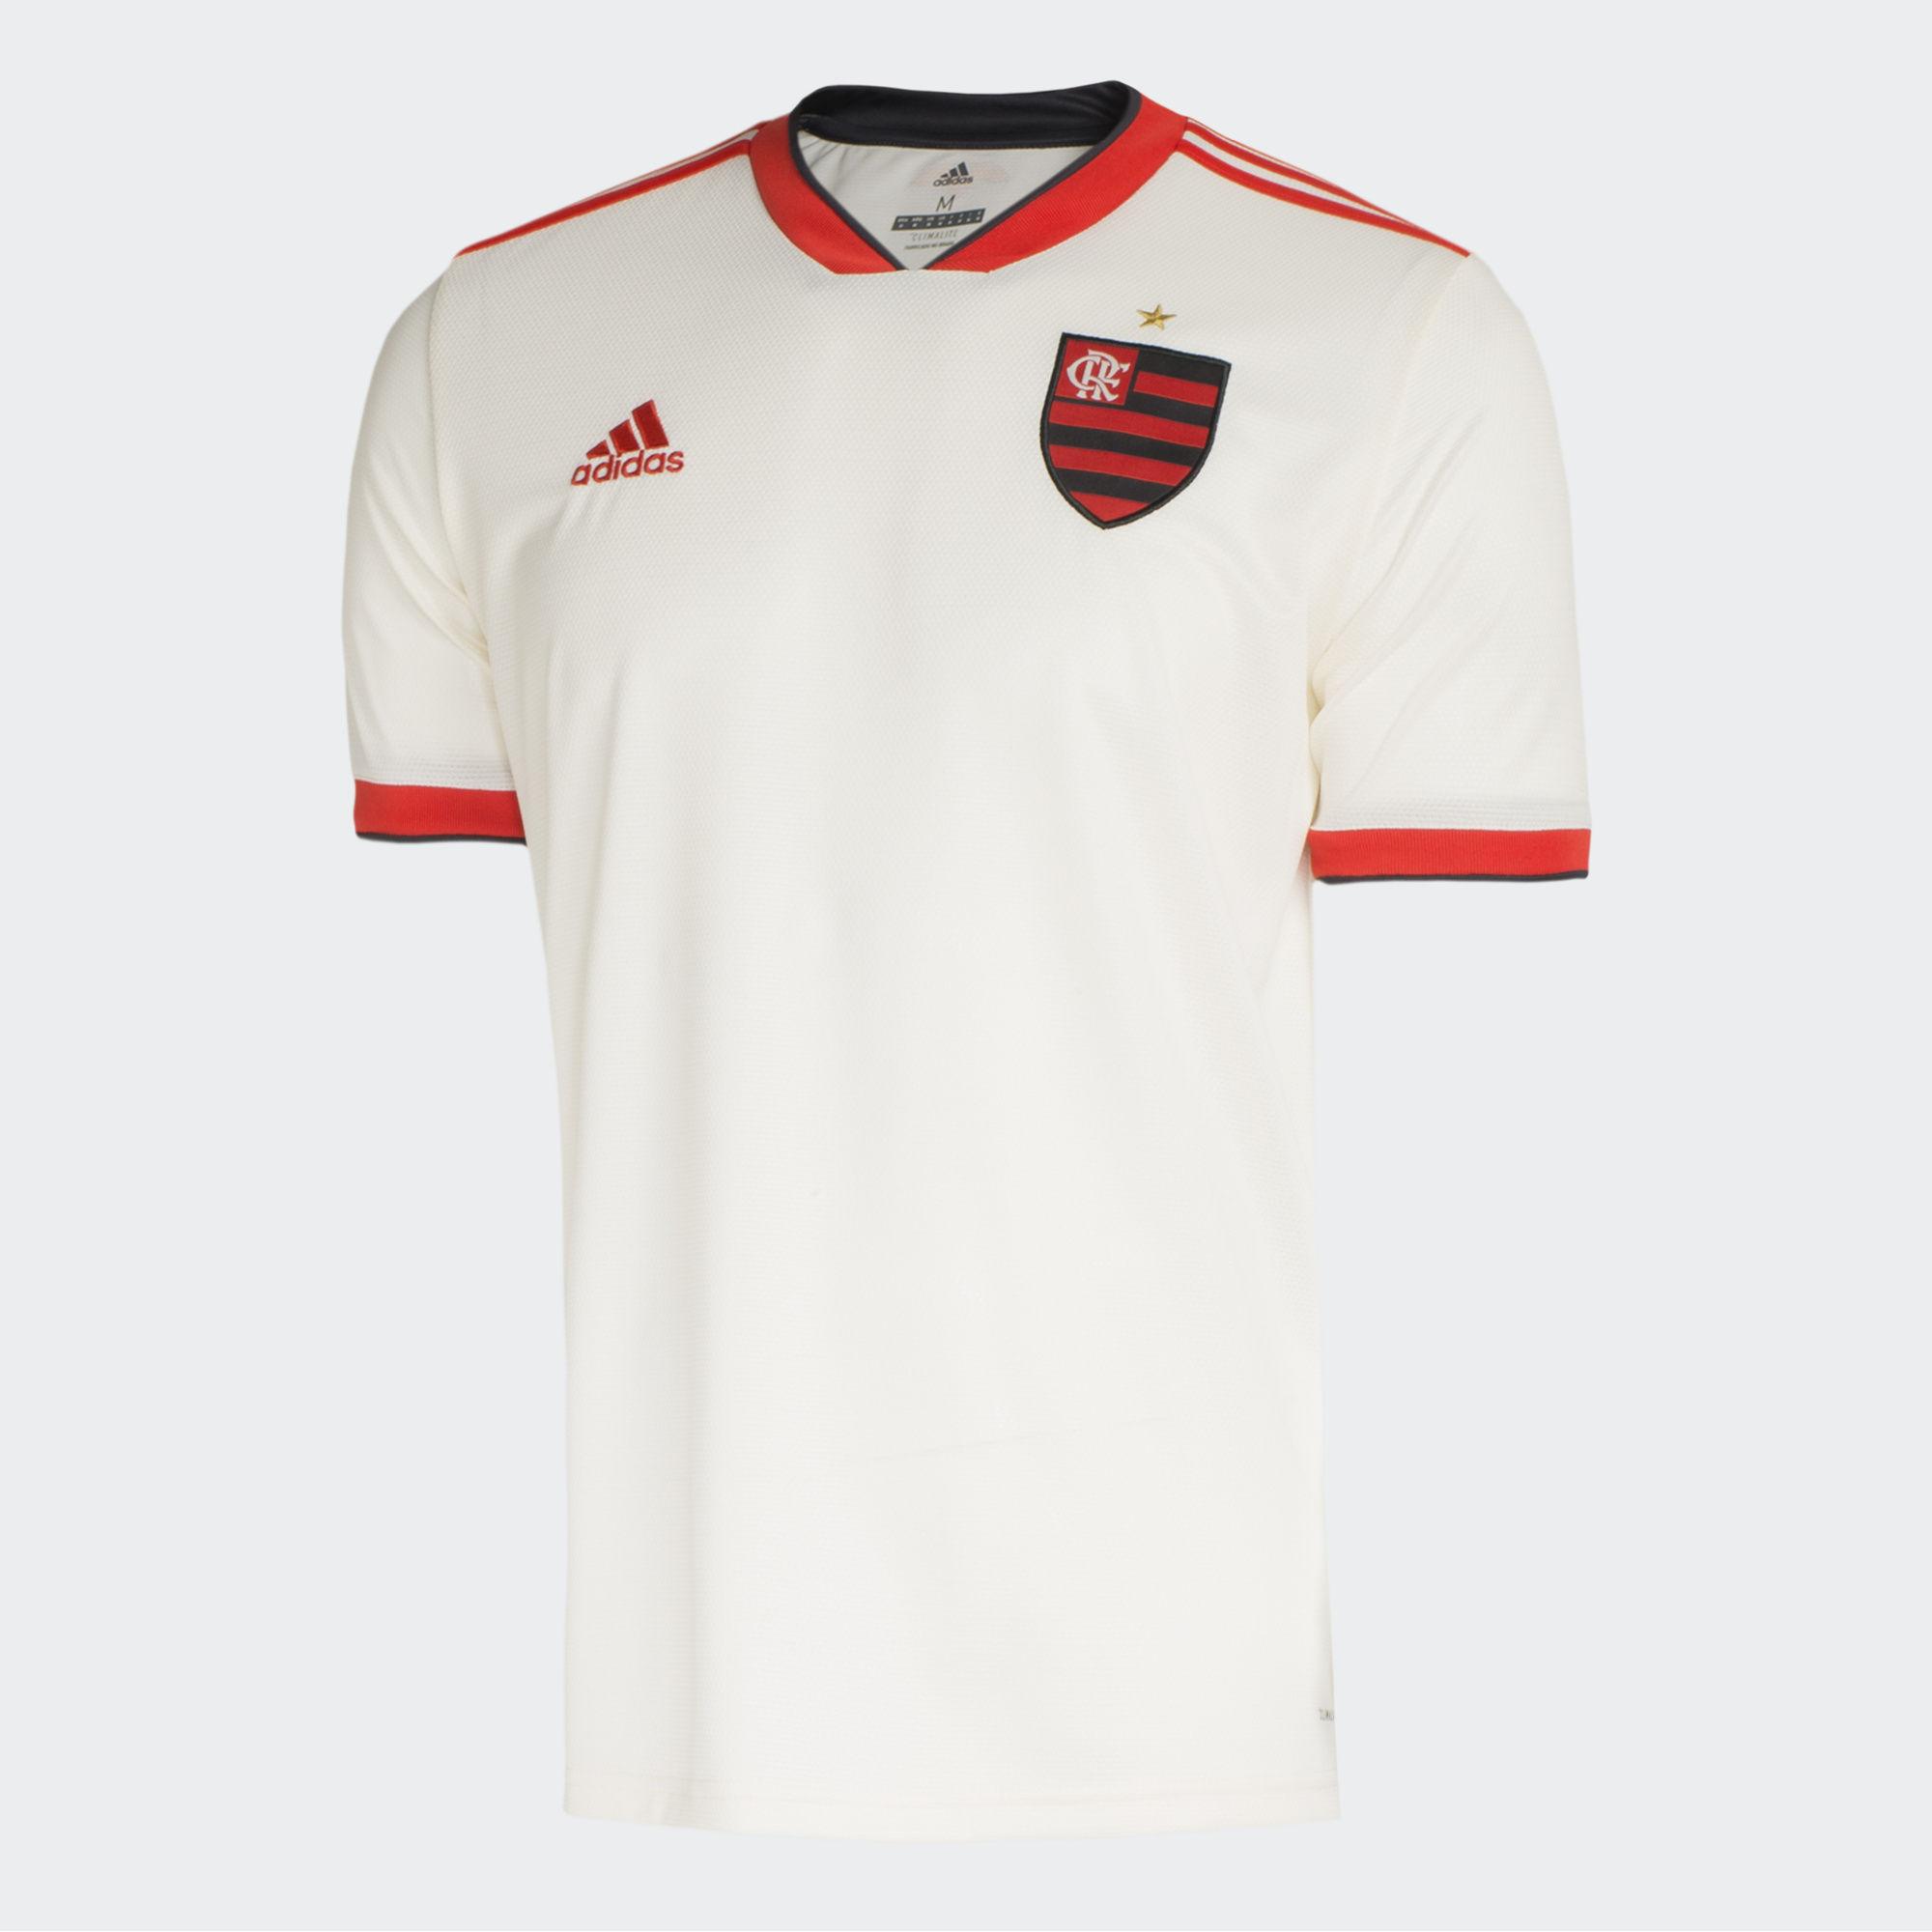 ... Flamengo 2018 Adidas Home Kit · Click to enlarge image  flamengo 2018 adidas away kit a.jpg ... fa37a088f